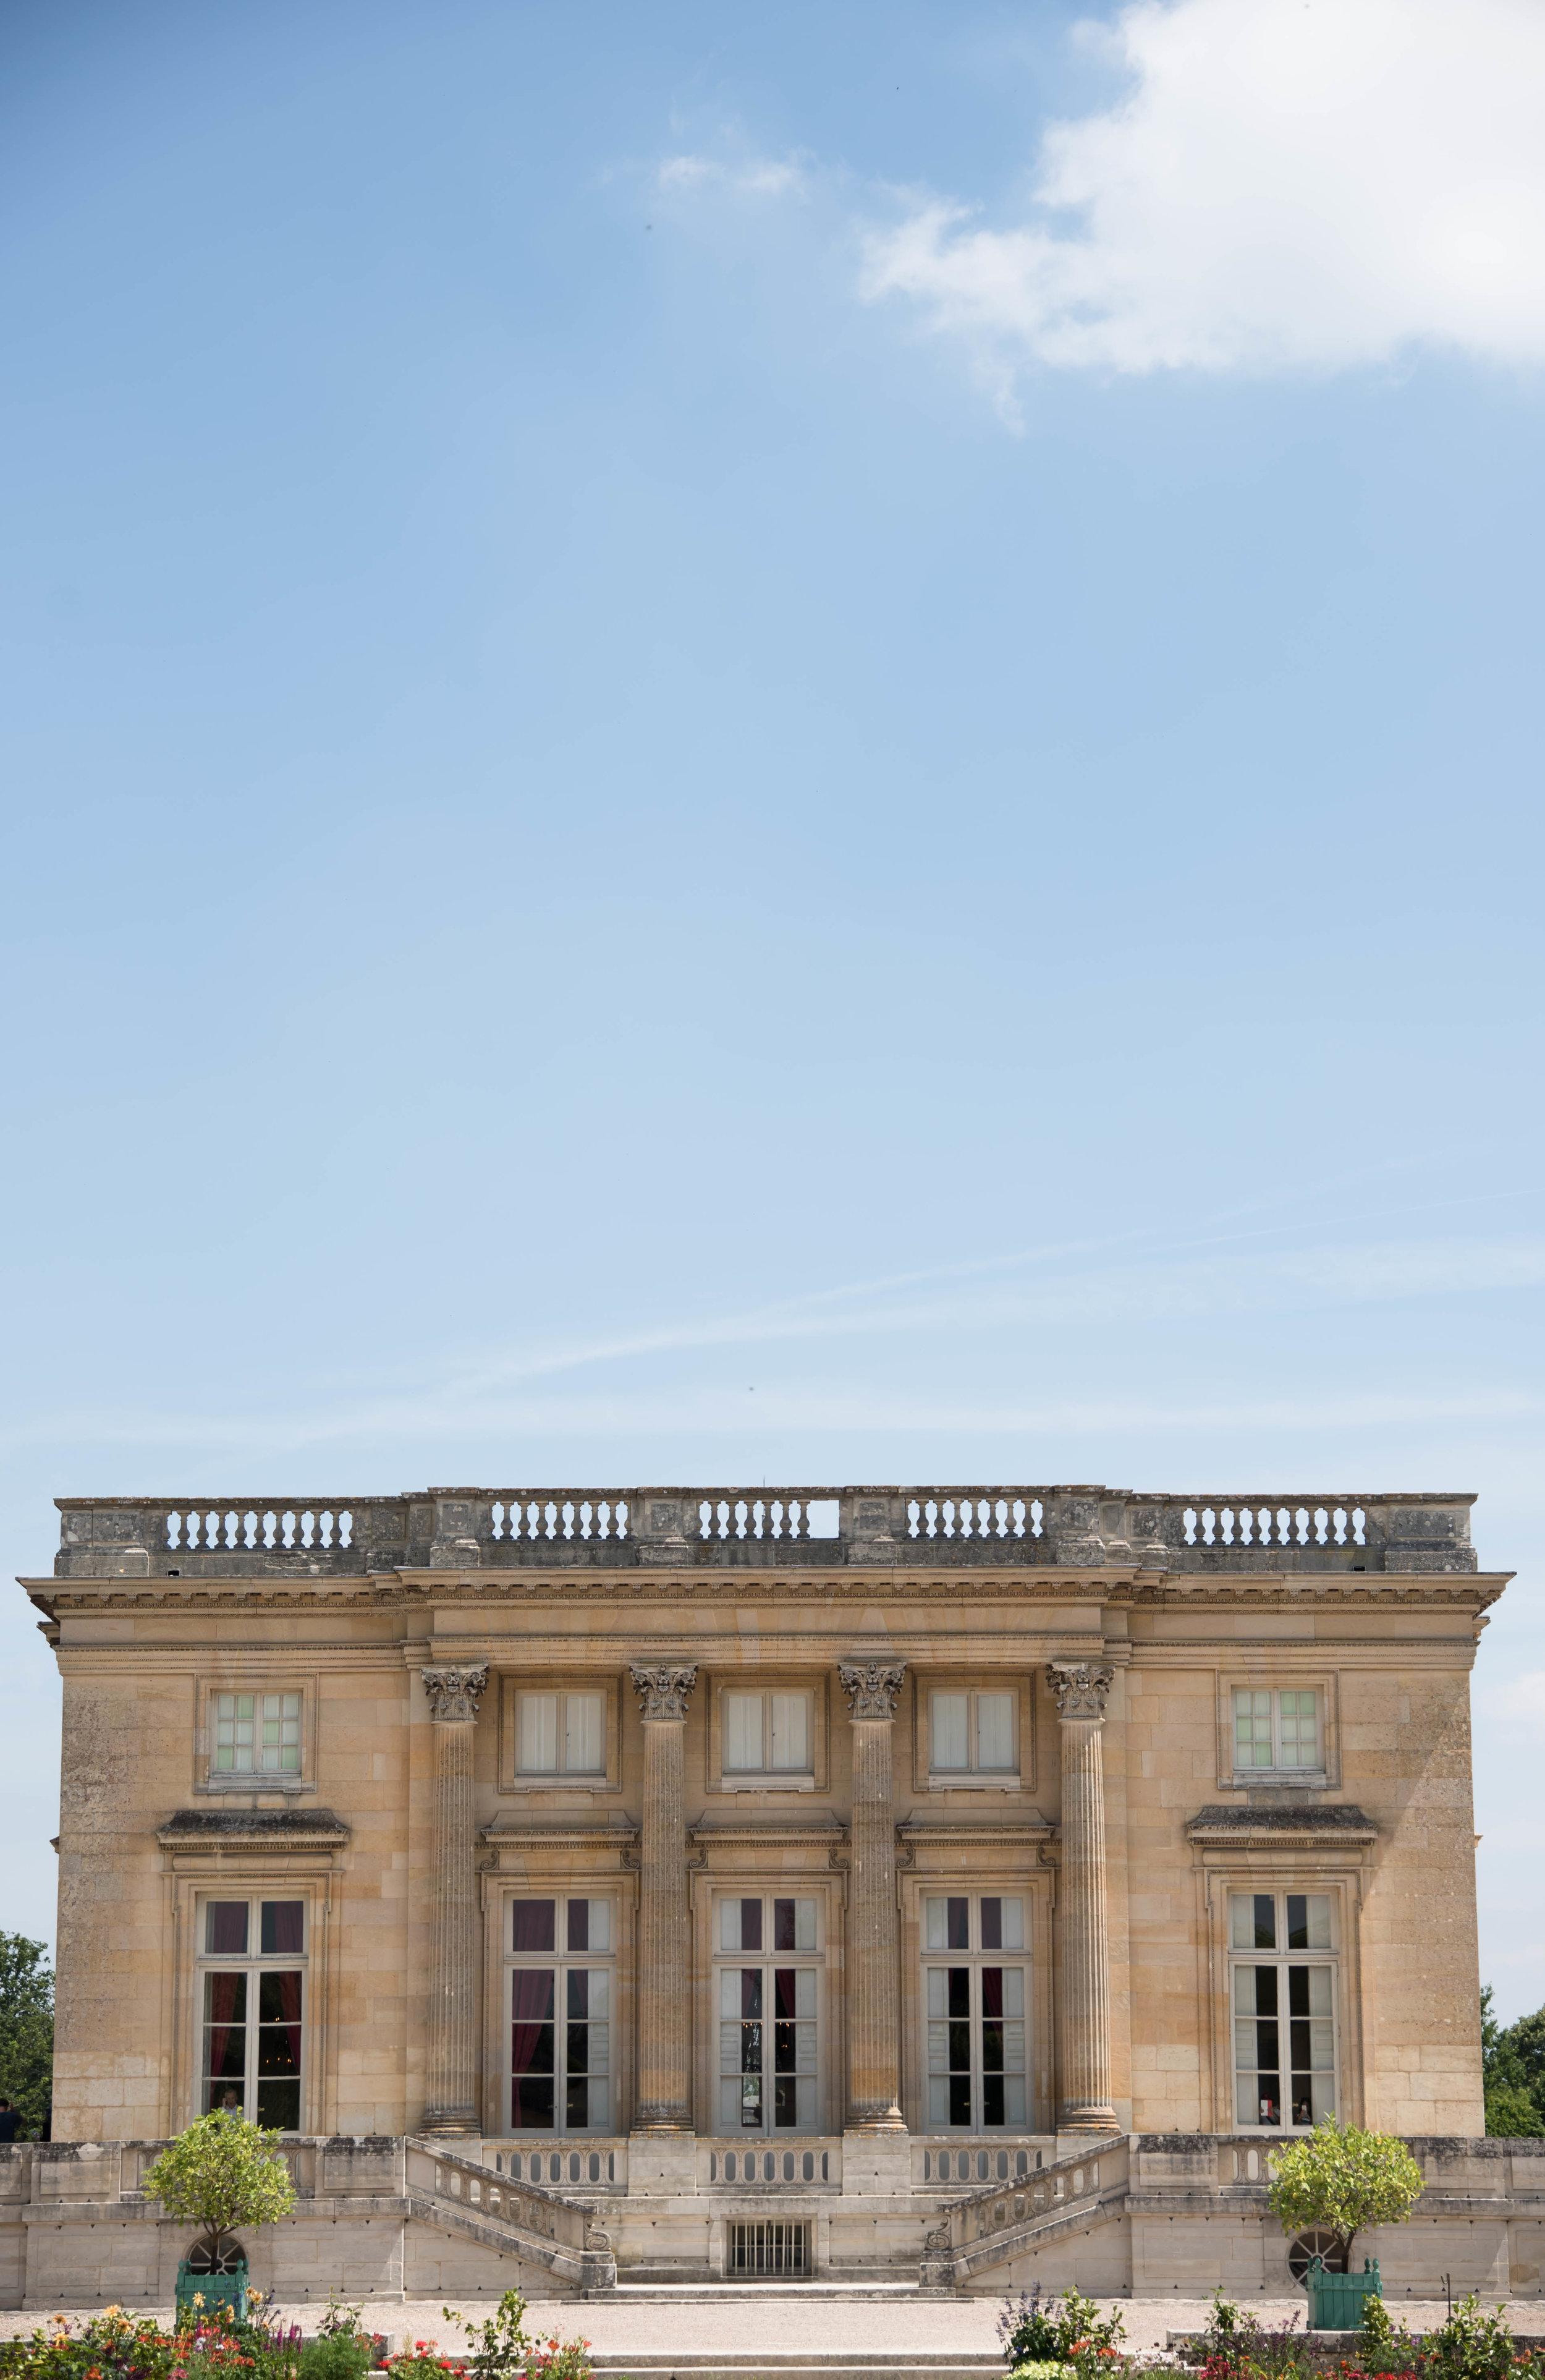 ROSE & IVY Journal Garden Dreamer Solitude Among the Beauty of Versailles